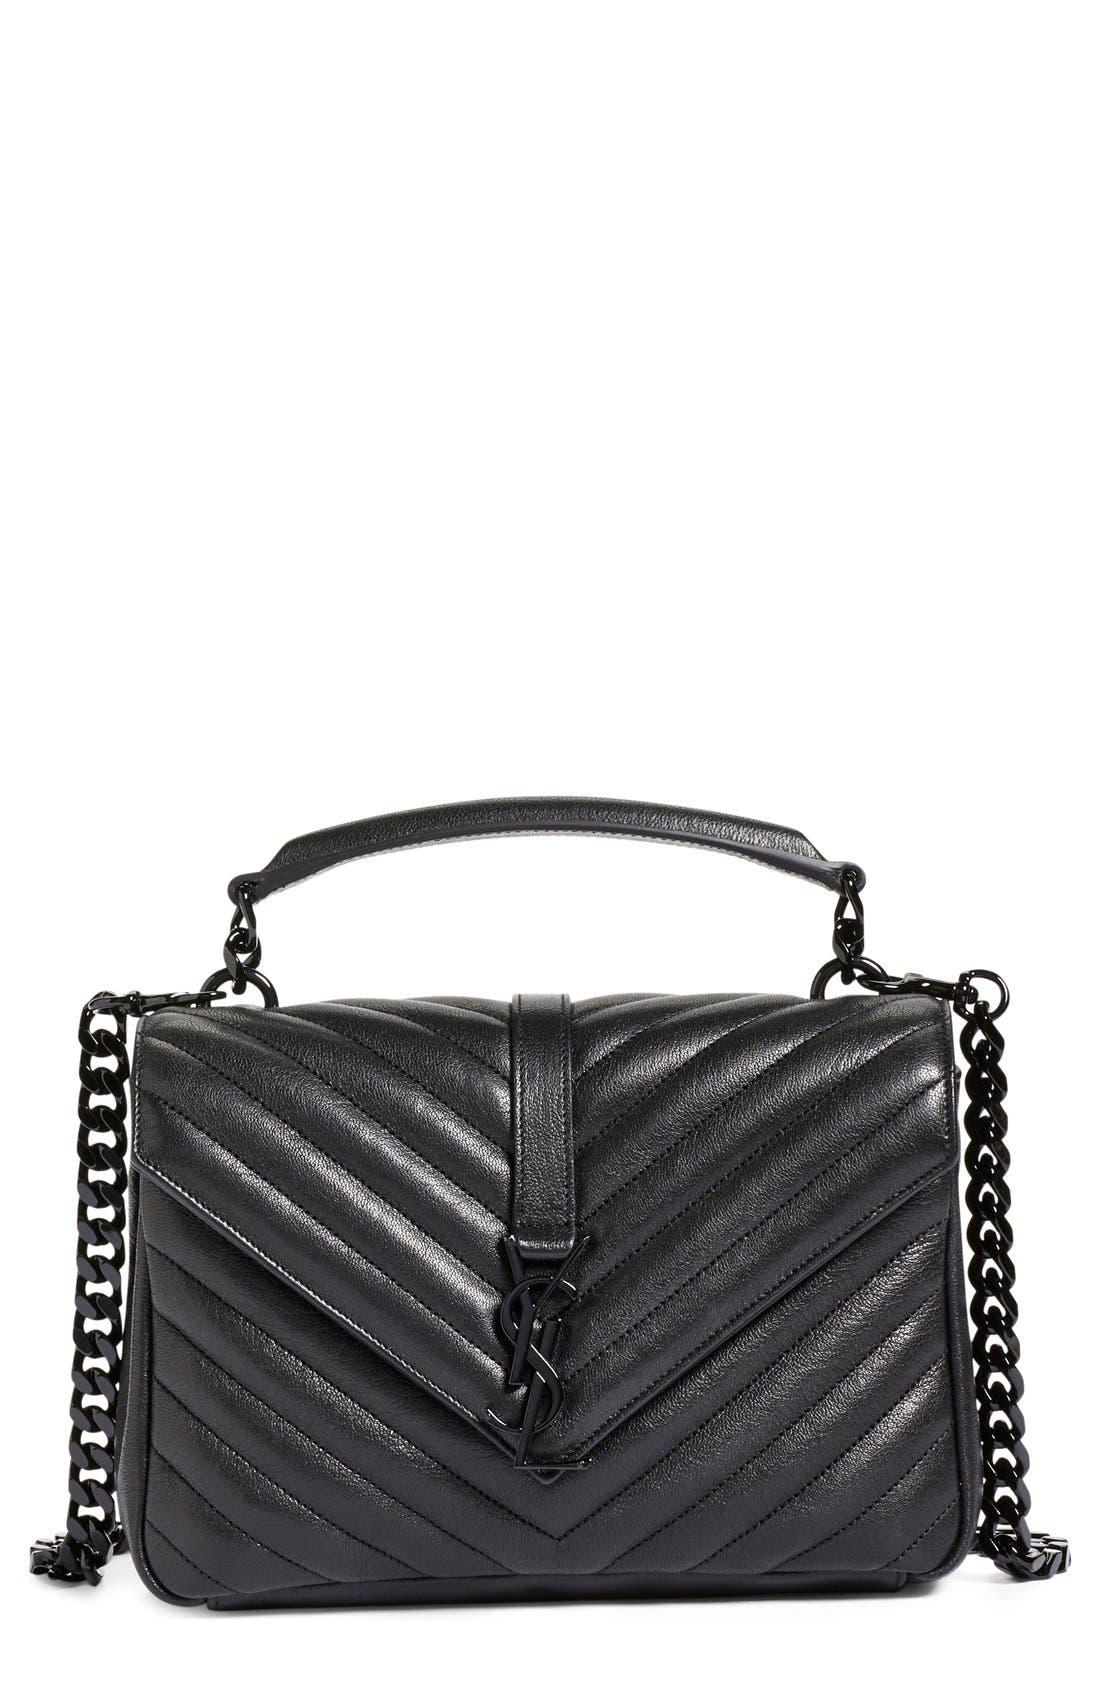 Main Image - Saint Laurent 'Medium College' Quilted Leather Shoulder Bag